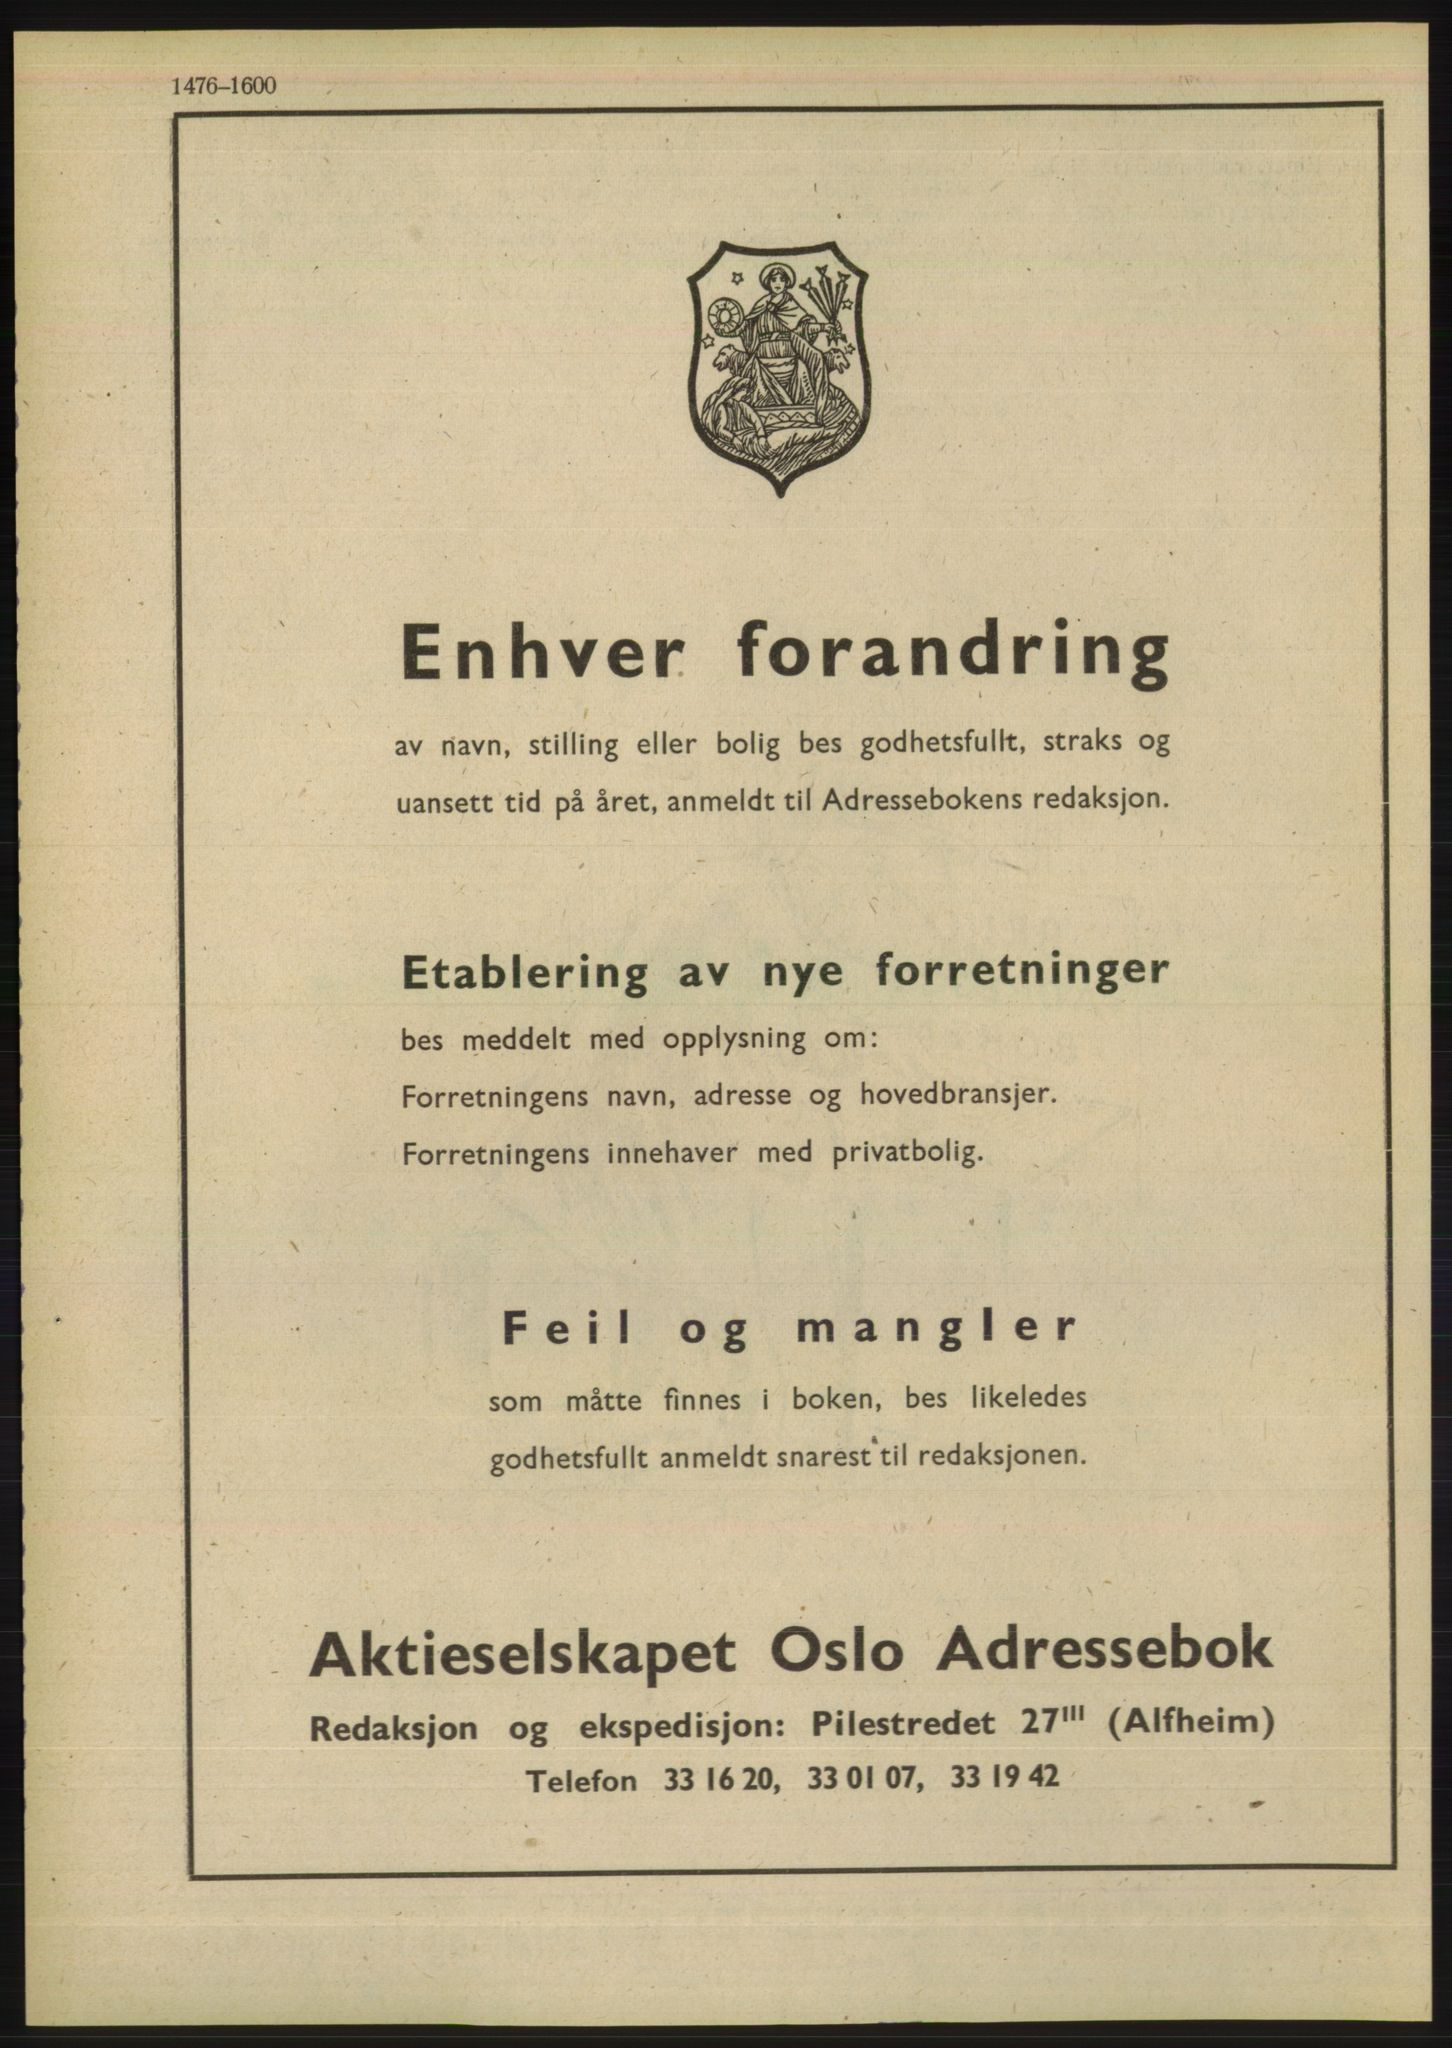 PUBL, Kristiania/Oslo adressebok, 1948, s. 1476